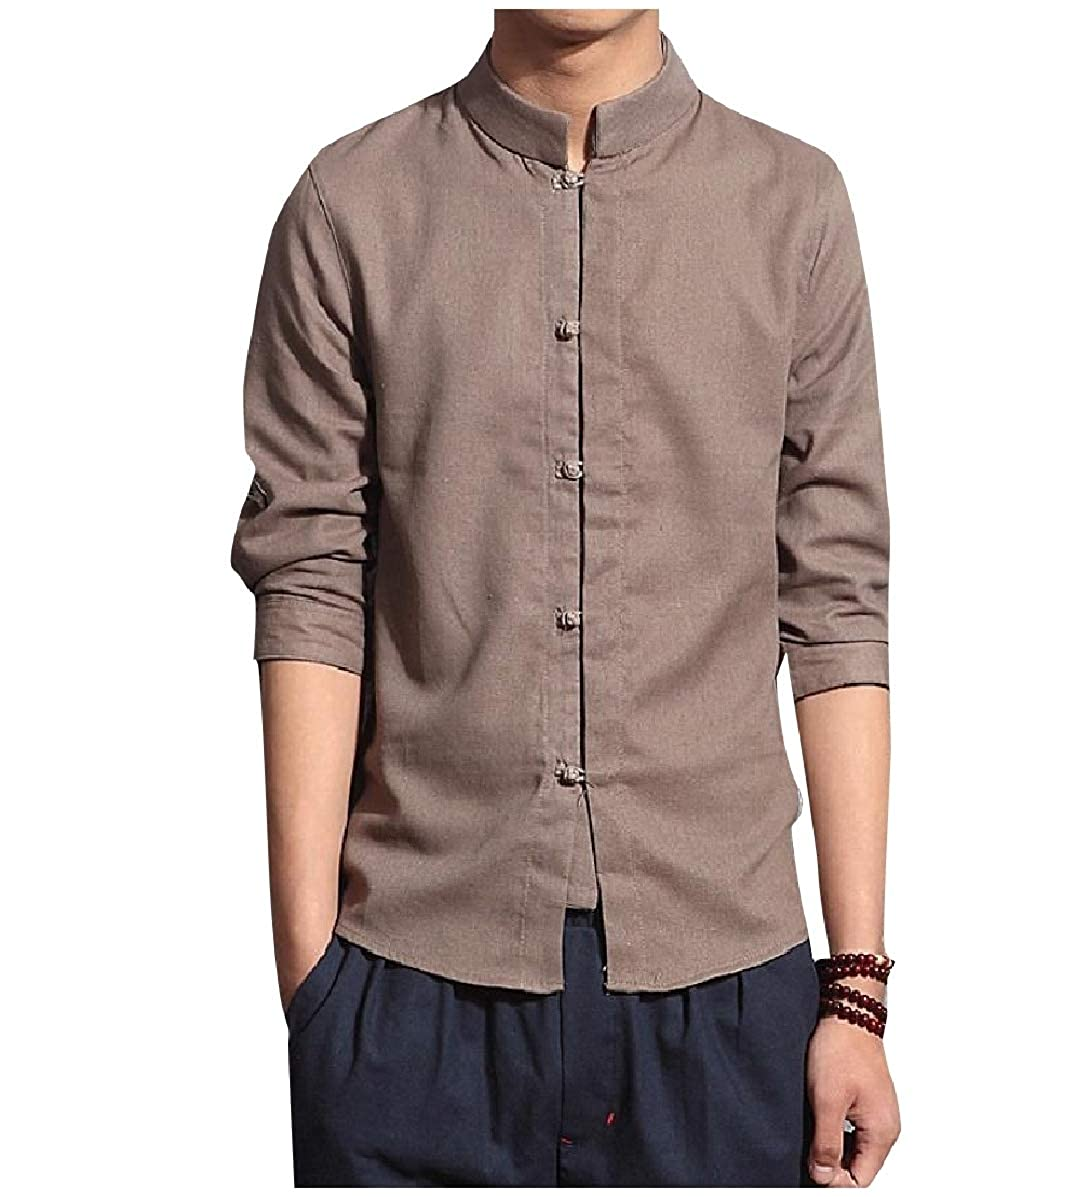 YUNY Mens Chinese Style Linen 3//4 Sleeve Back Cotton Western Shirt Khaki 4XL